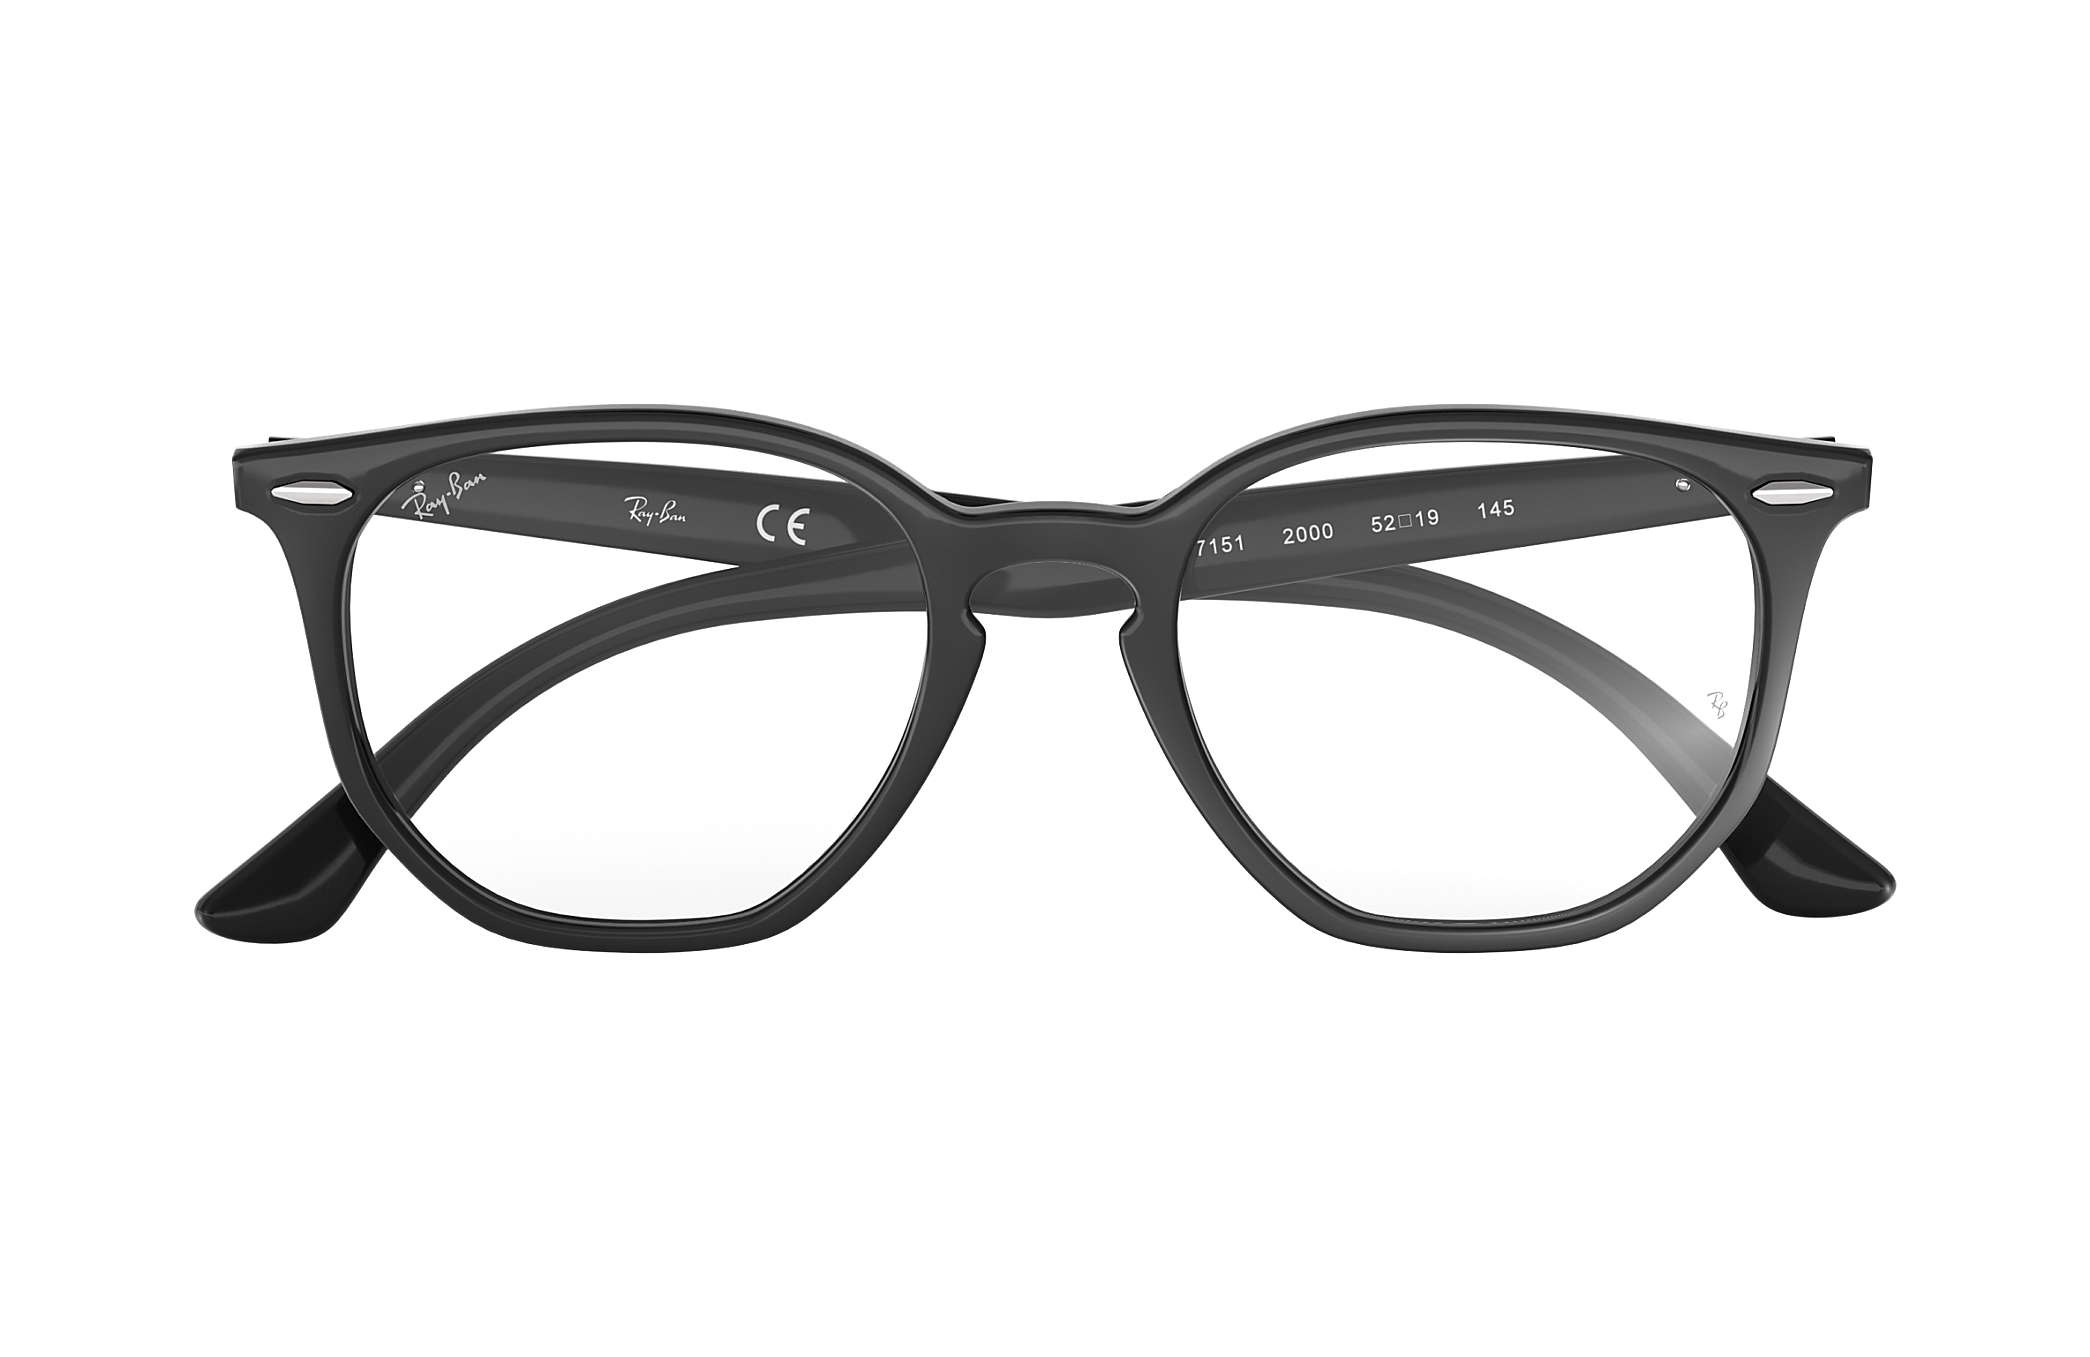 da5c093694 Ray-Ban prescription glasses Hexagonal Optics RB7151 Black - Acetate ...